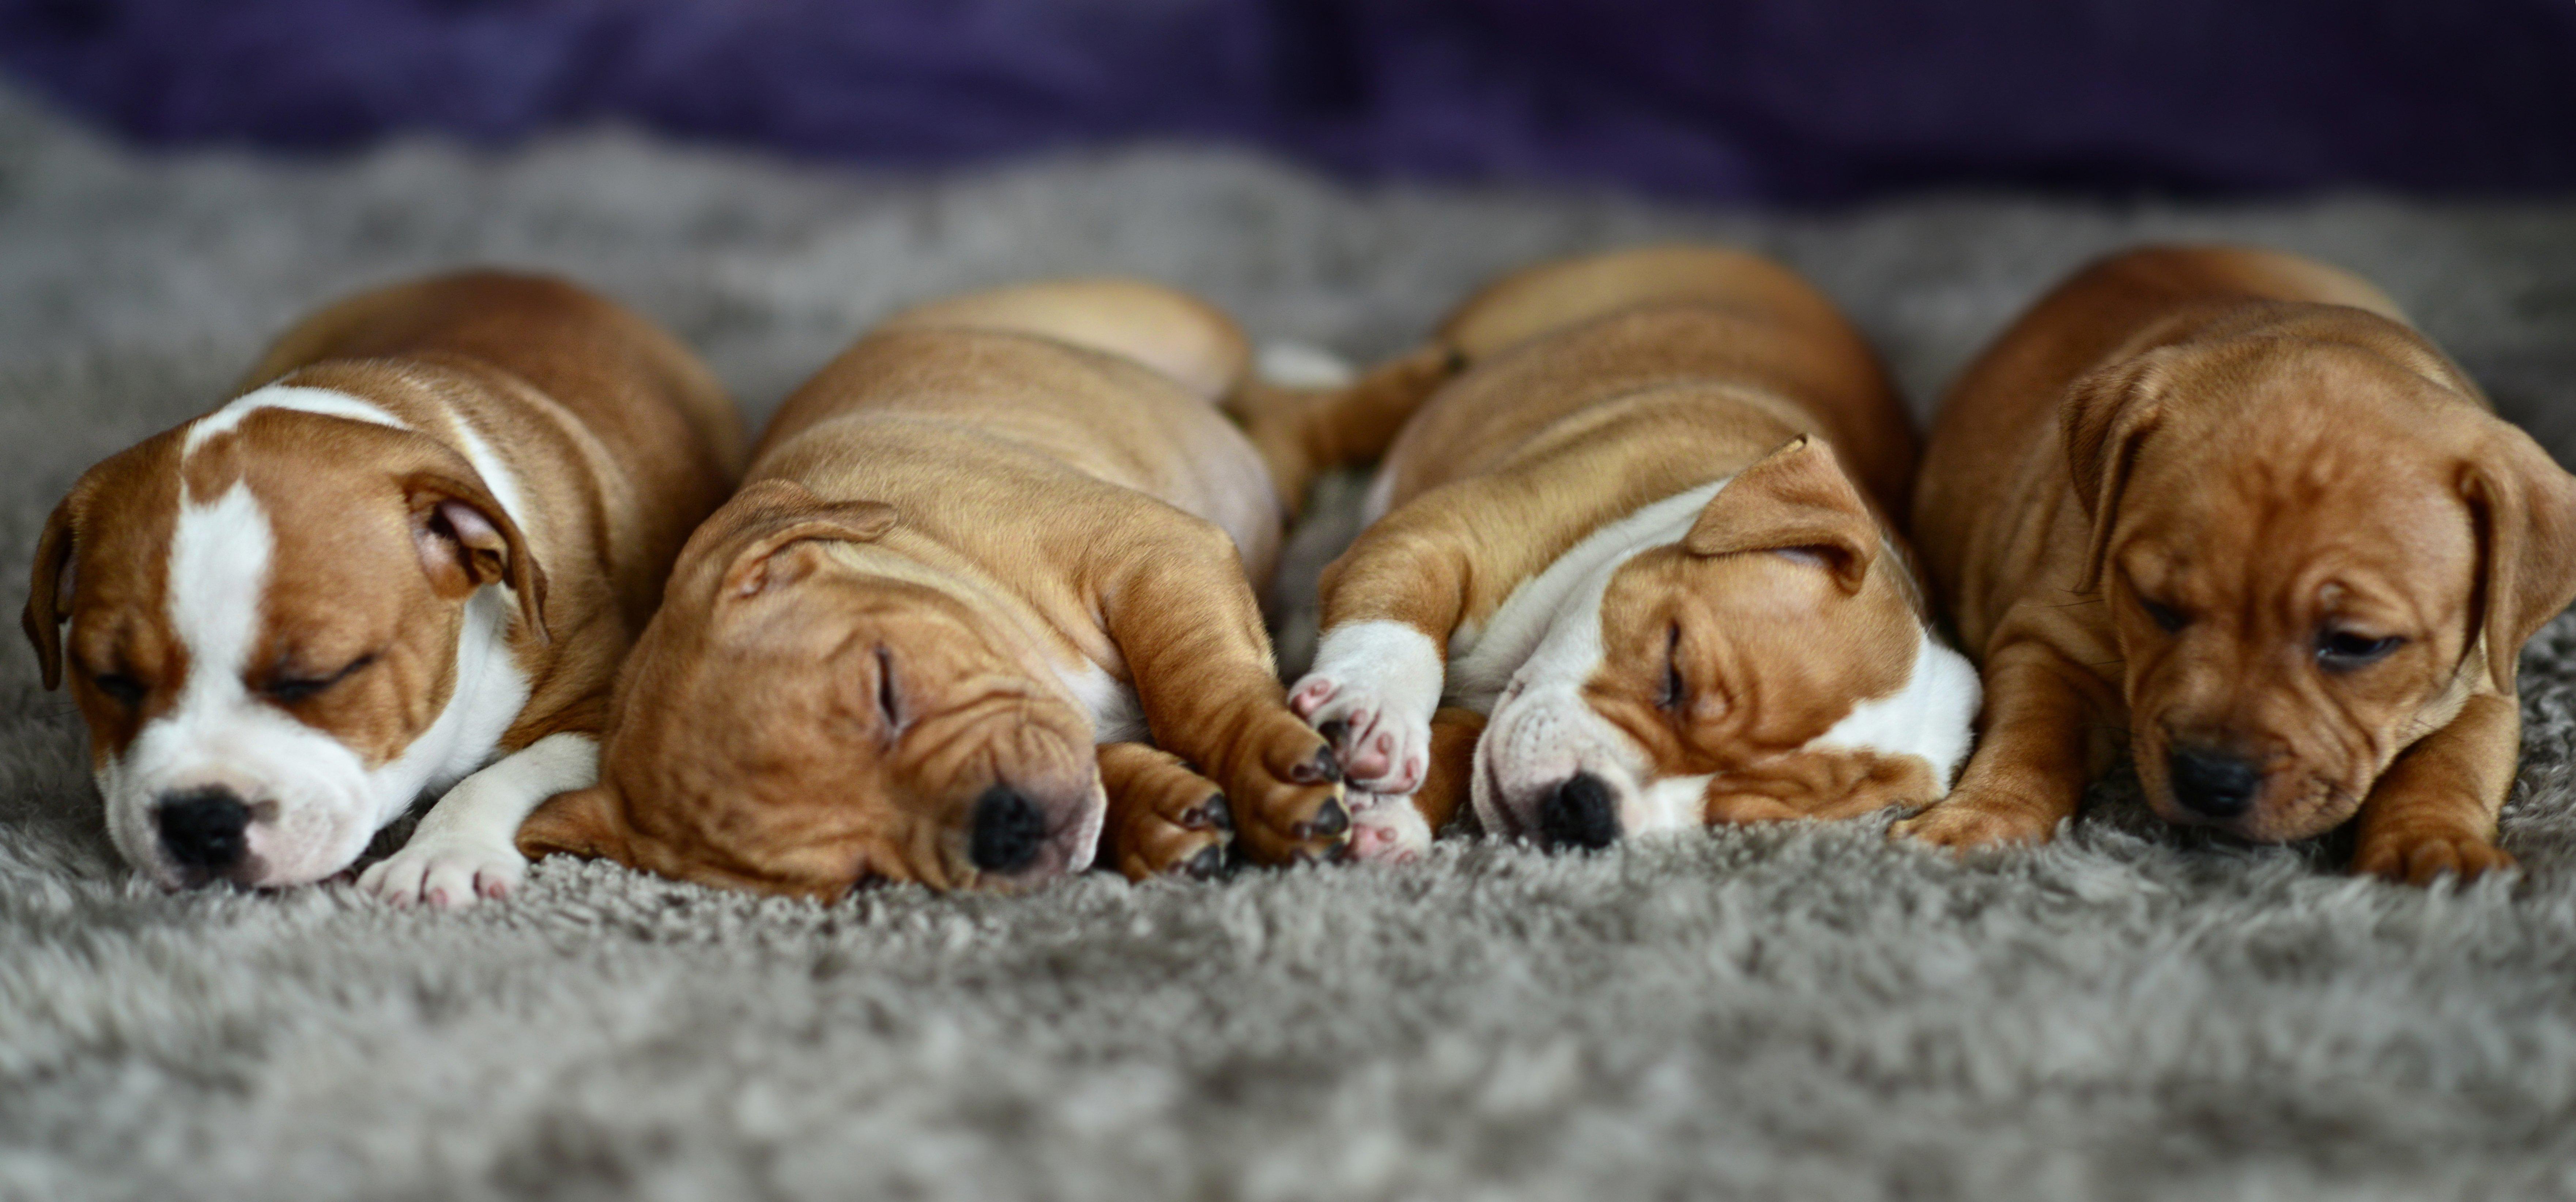 Baby Cute Puppy Dog Sleeping Sleep Wallpaper 7045x3287 649108 Wallpaperup